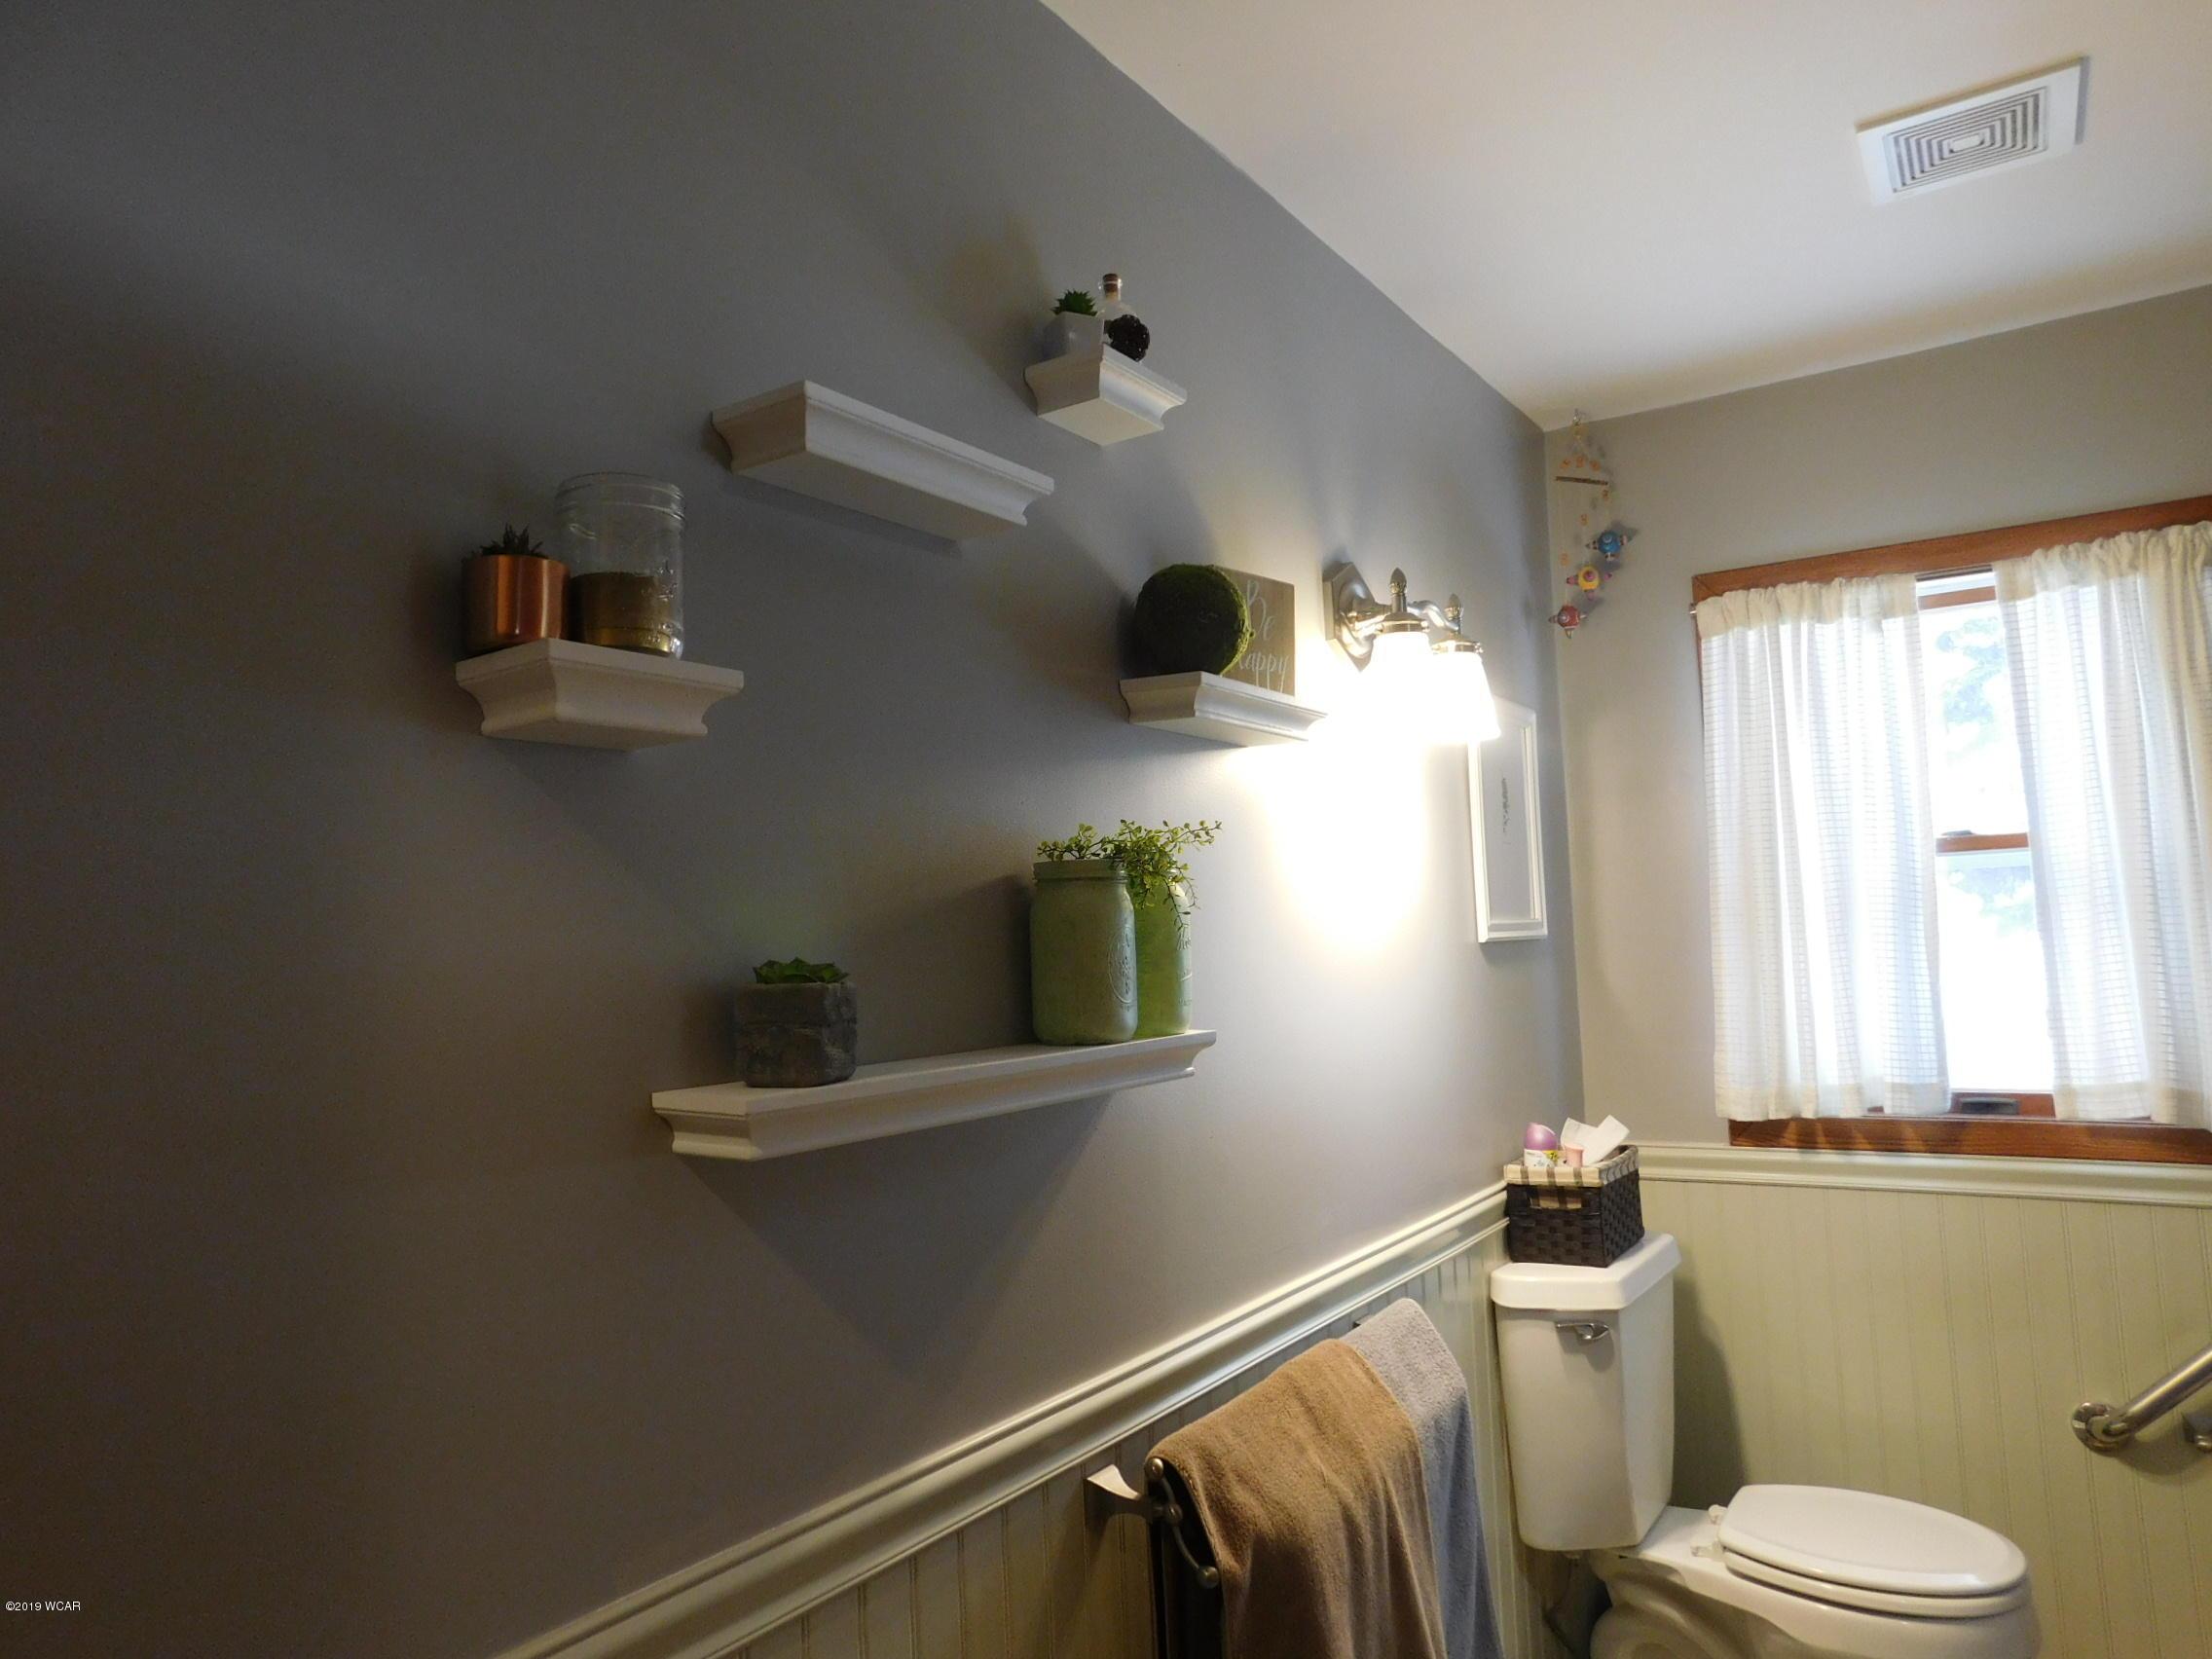 704 Breu Avenue,Olivia,3 Bedrooms Bedrooms,1 BathroomBathrooms,Single Family,Breu Avenue,6033323